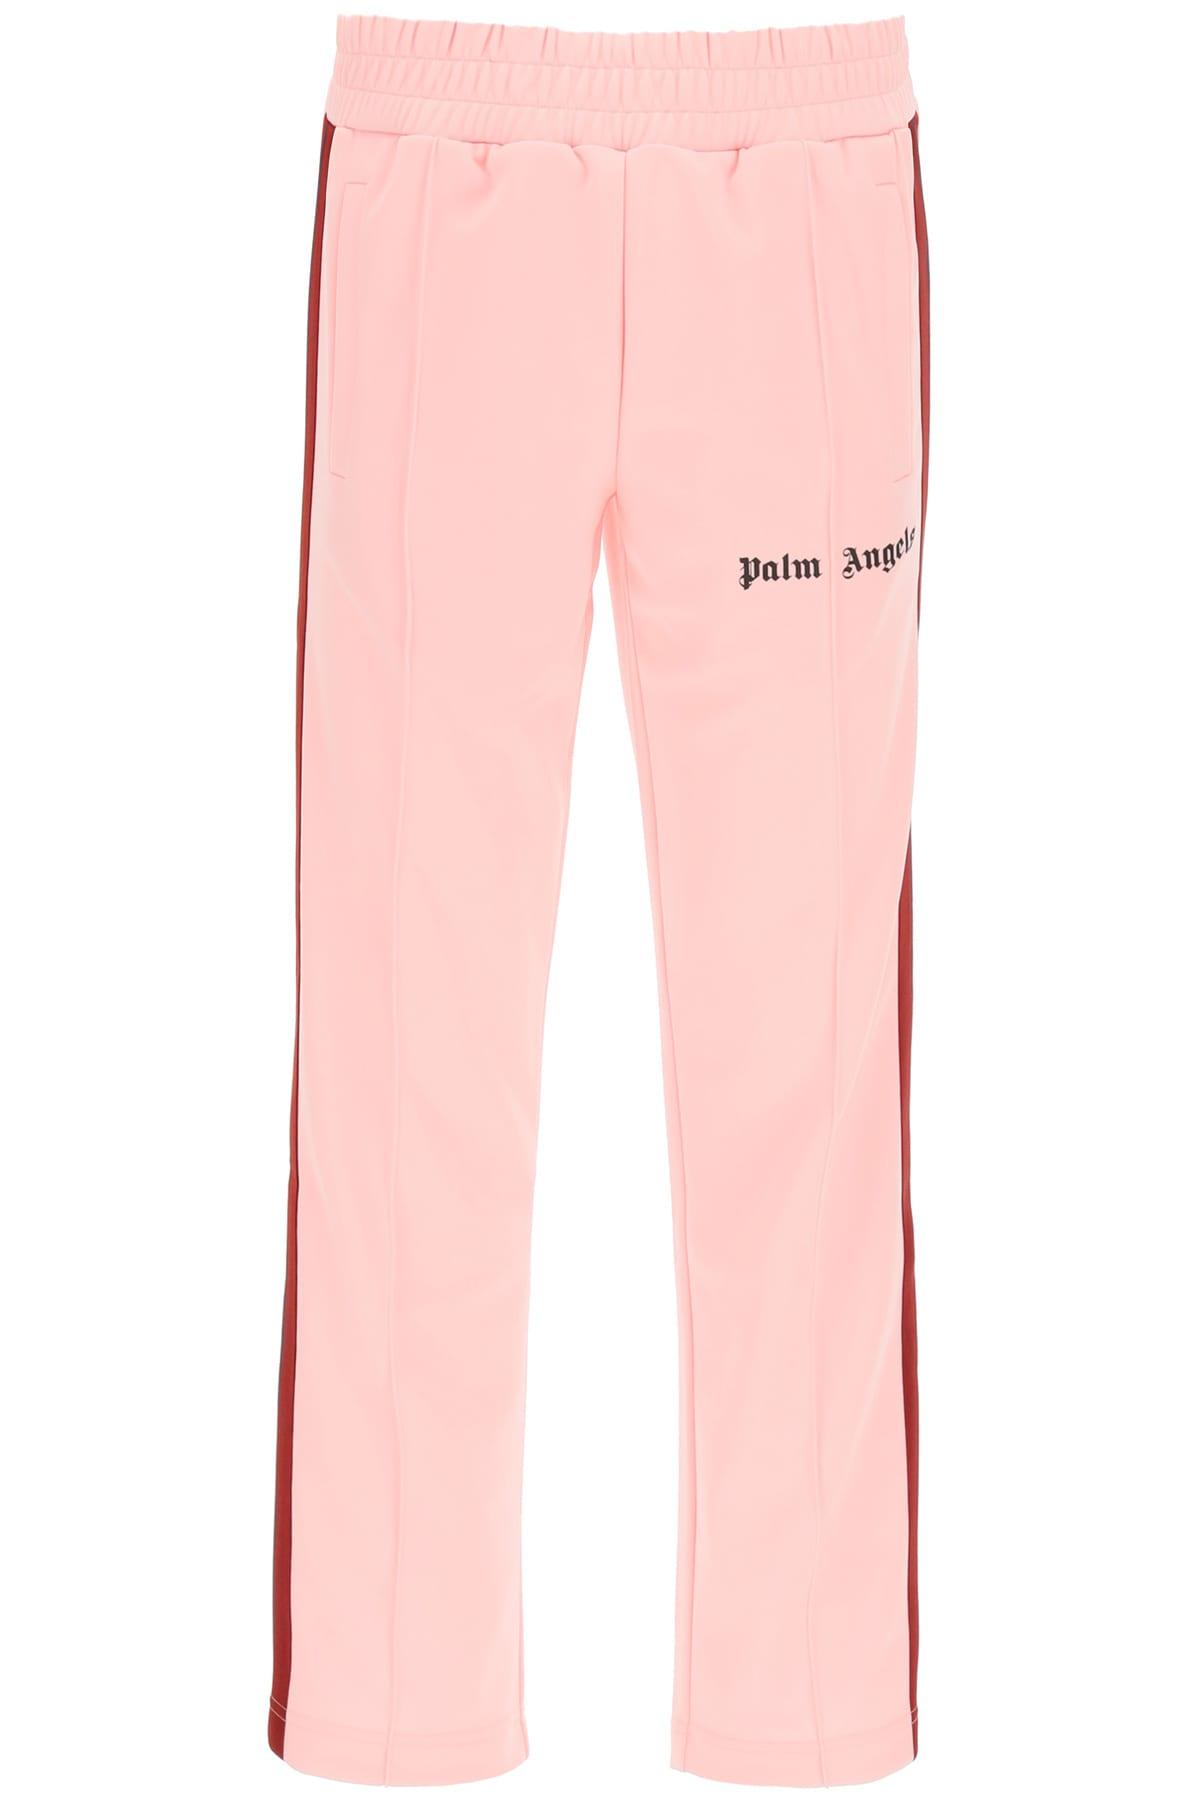 Palm Angels Track pants CLASSIC JOGGING TROUSERS